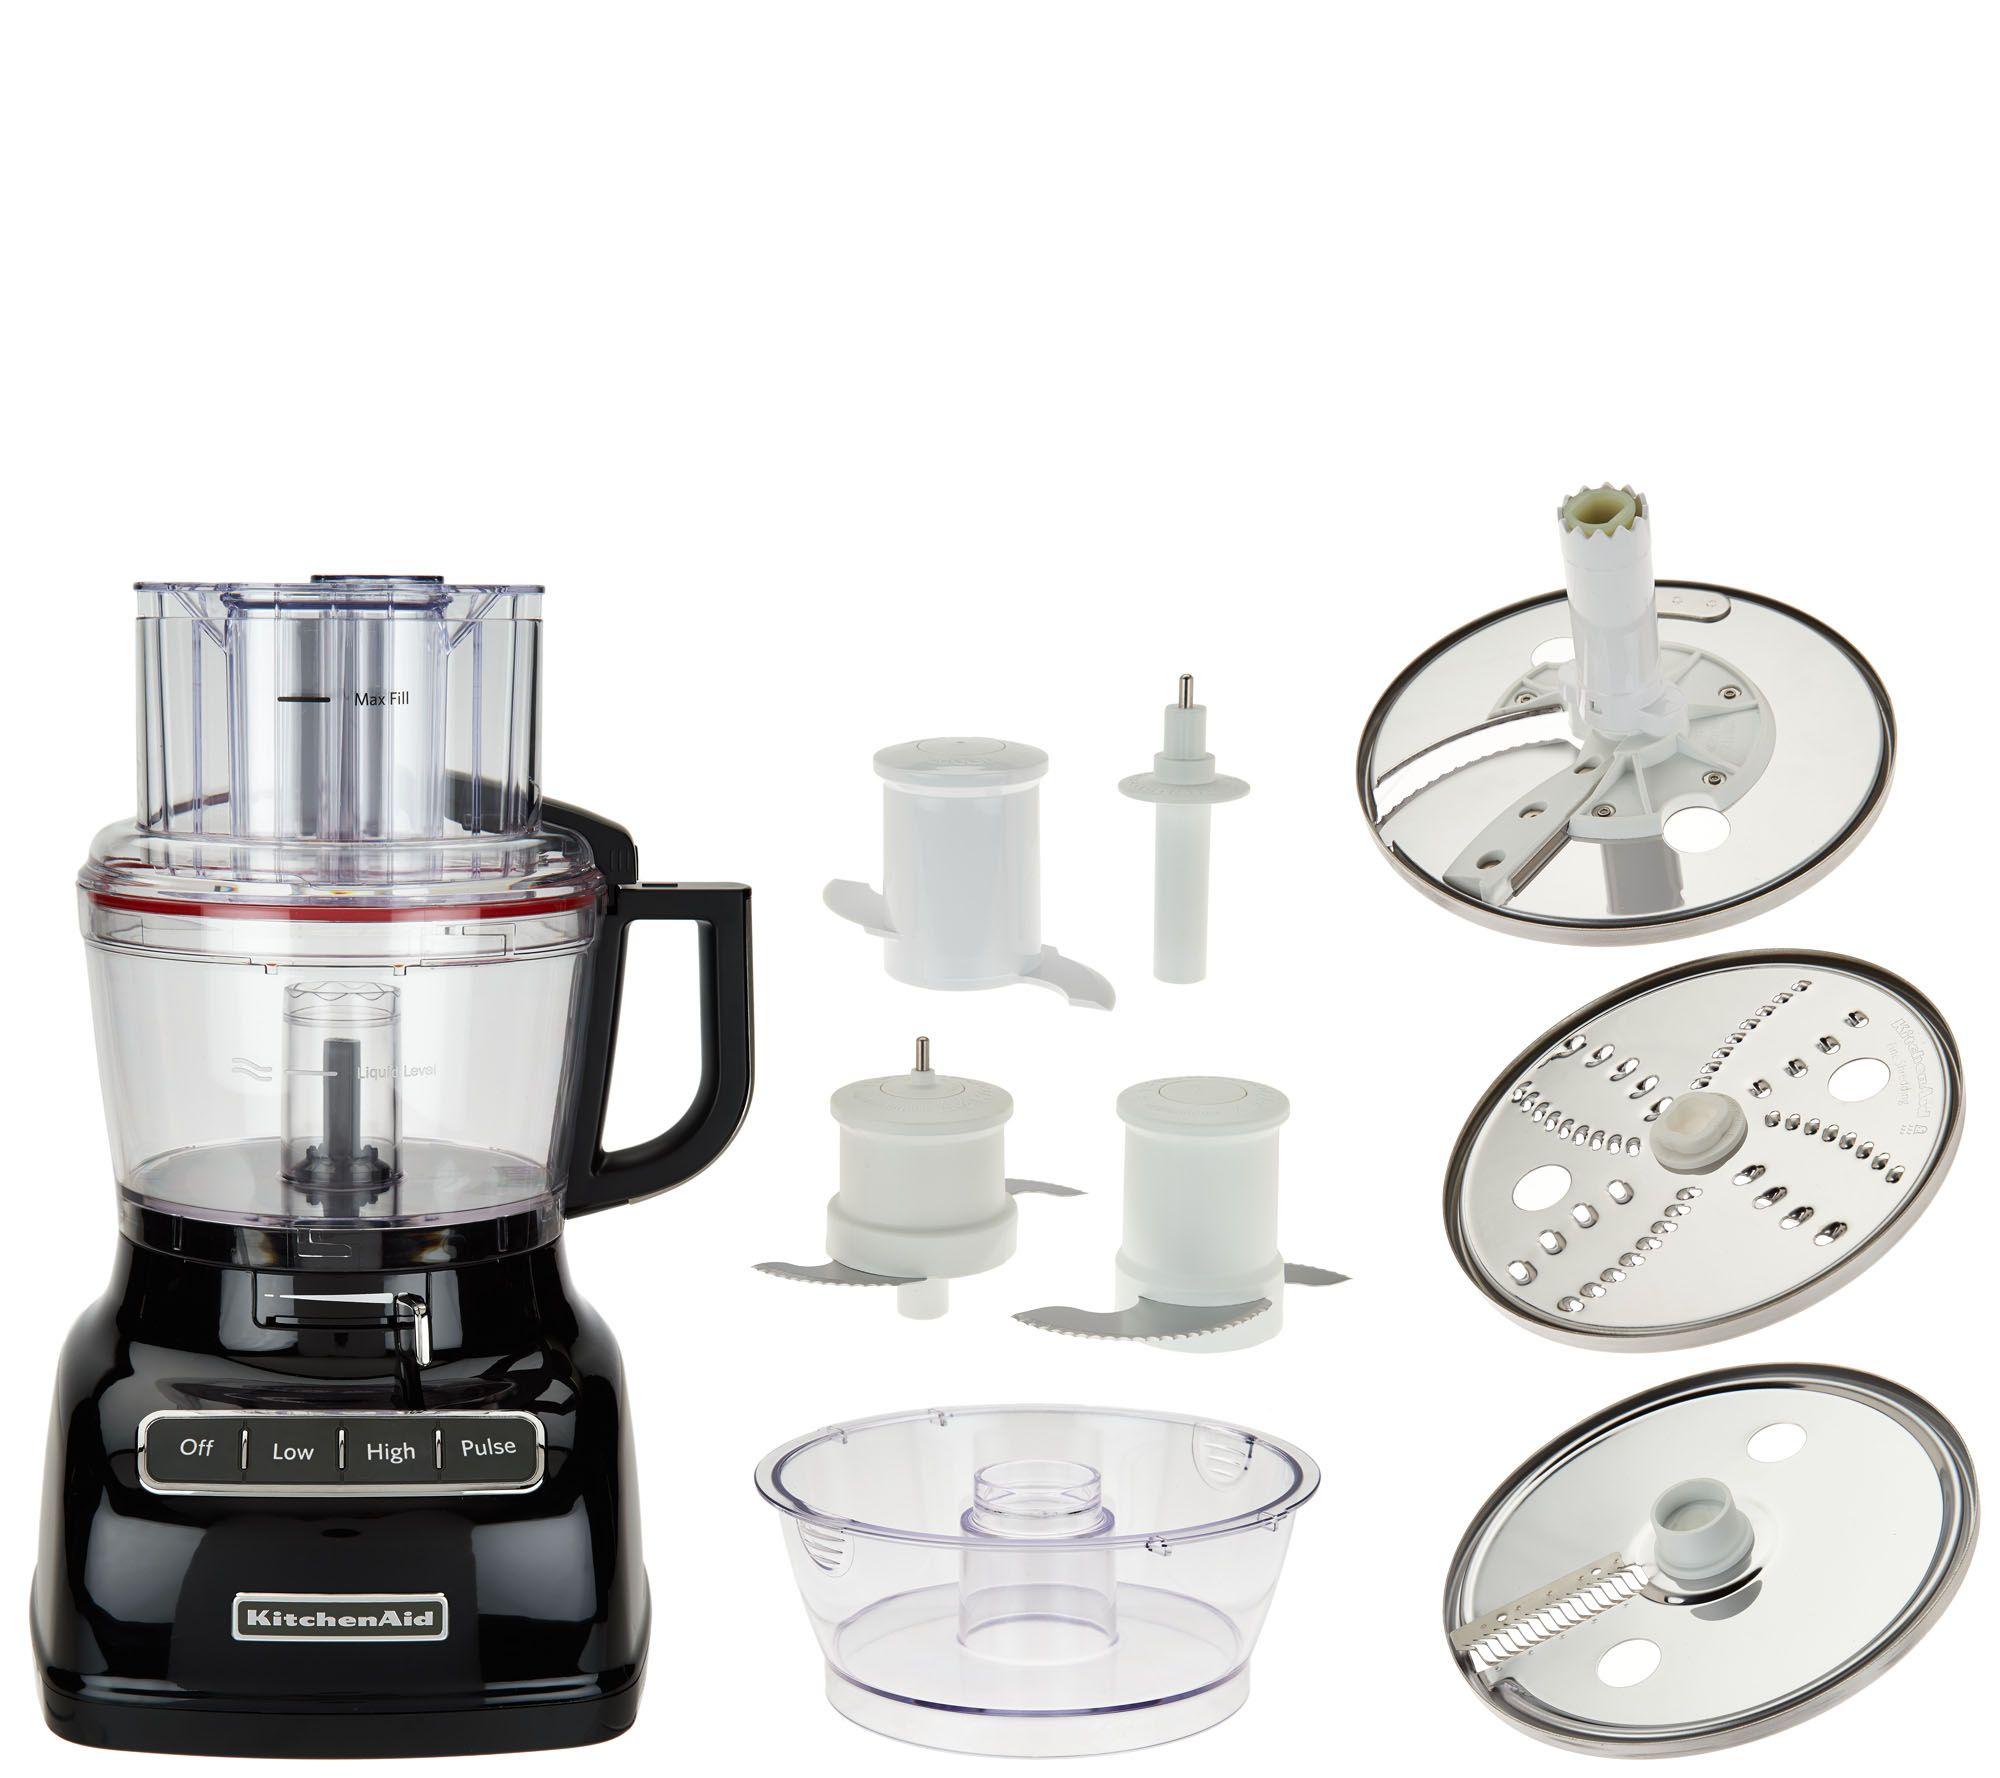 Kitchenaid 9 cup exact slice food processor - Kitchenaid food processor opinioni ...